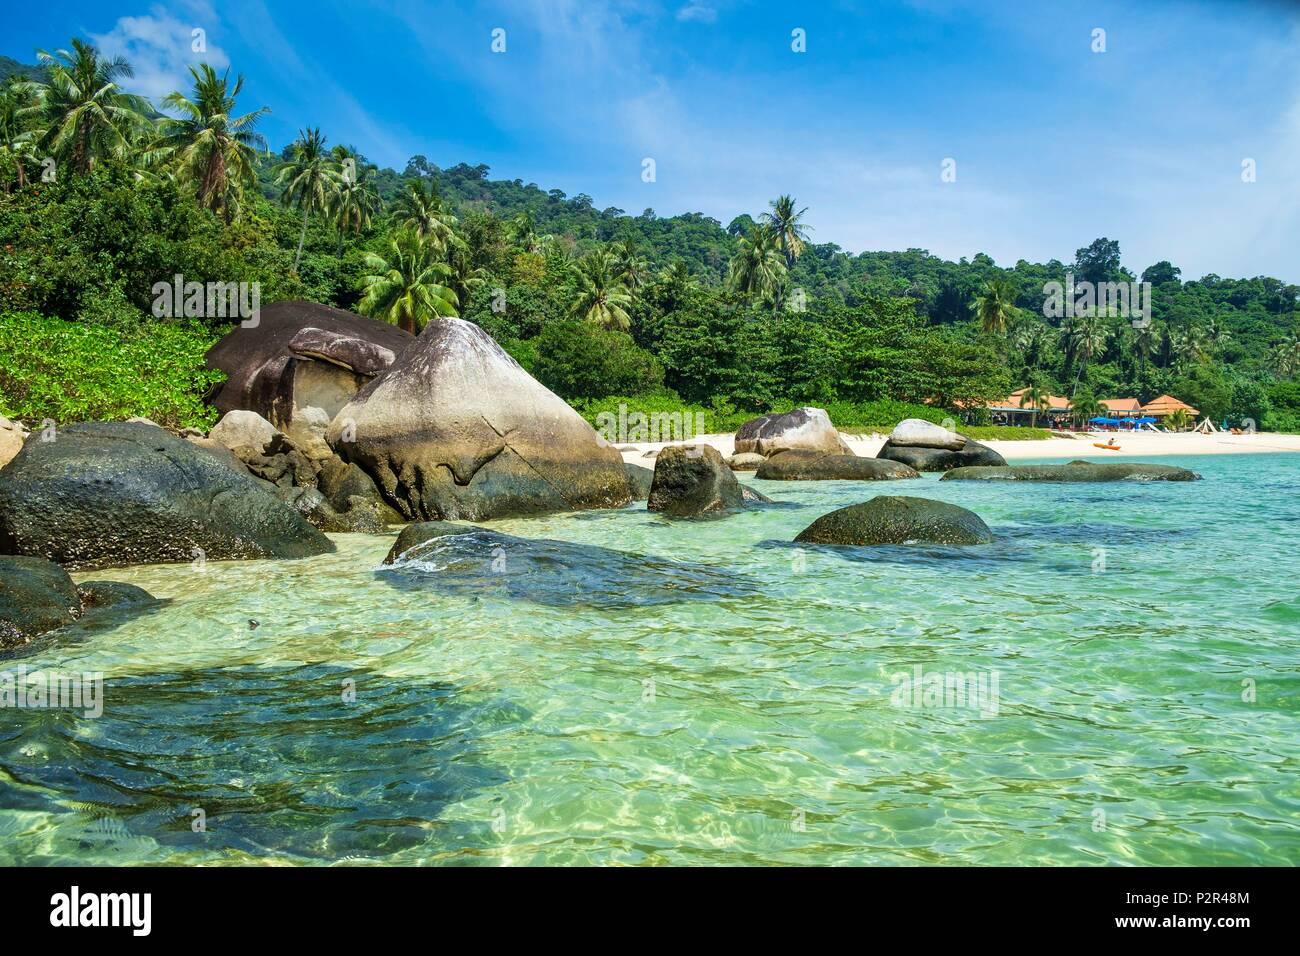 Thailand, Satun province, Tarutao National Marine Park, Ko Adang island, the beach of Adang Resort hotel - Stock Image